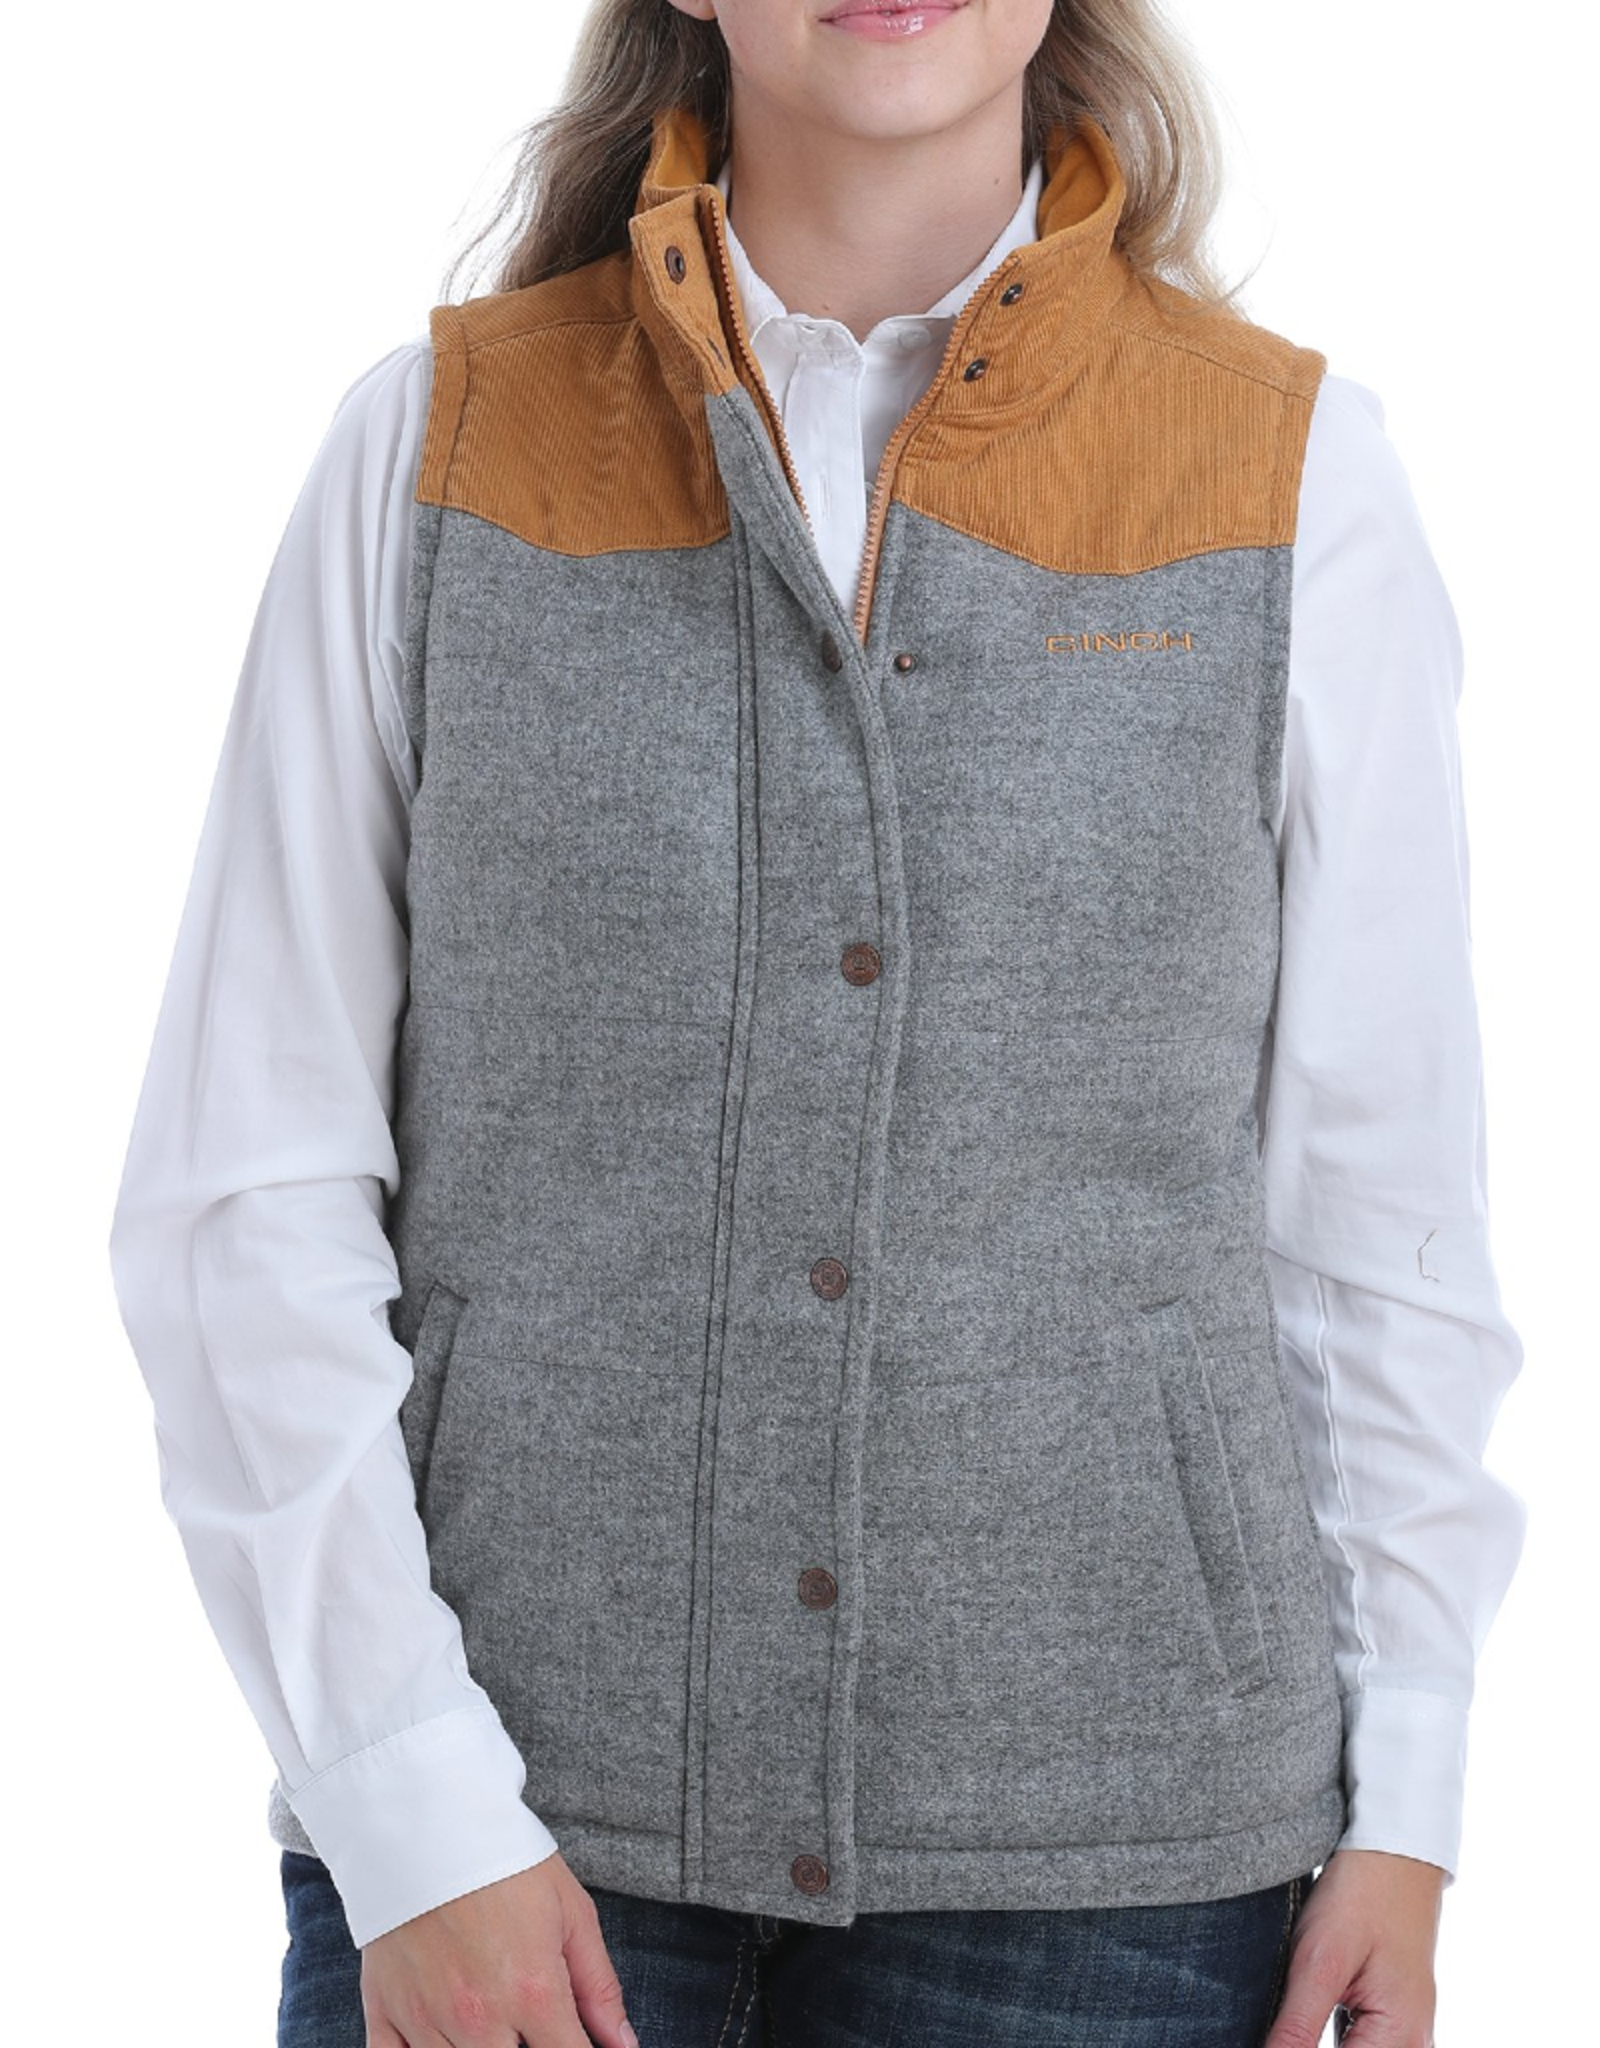 Cinch Cinch Brushed Tweed Vest